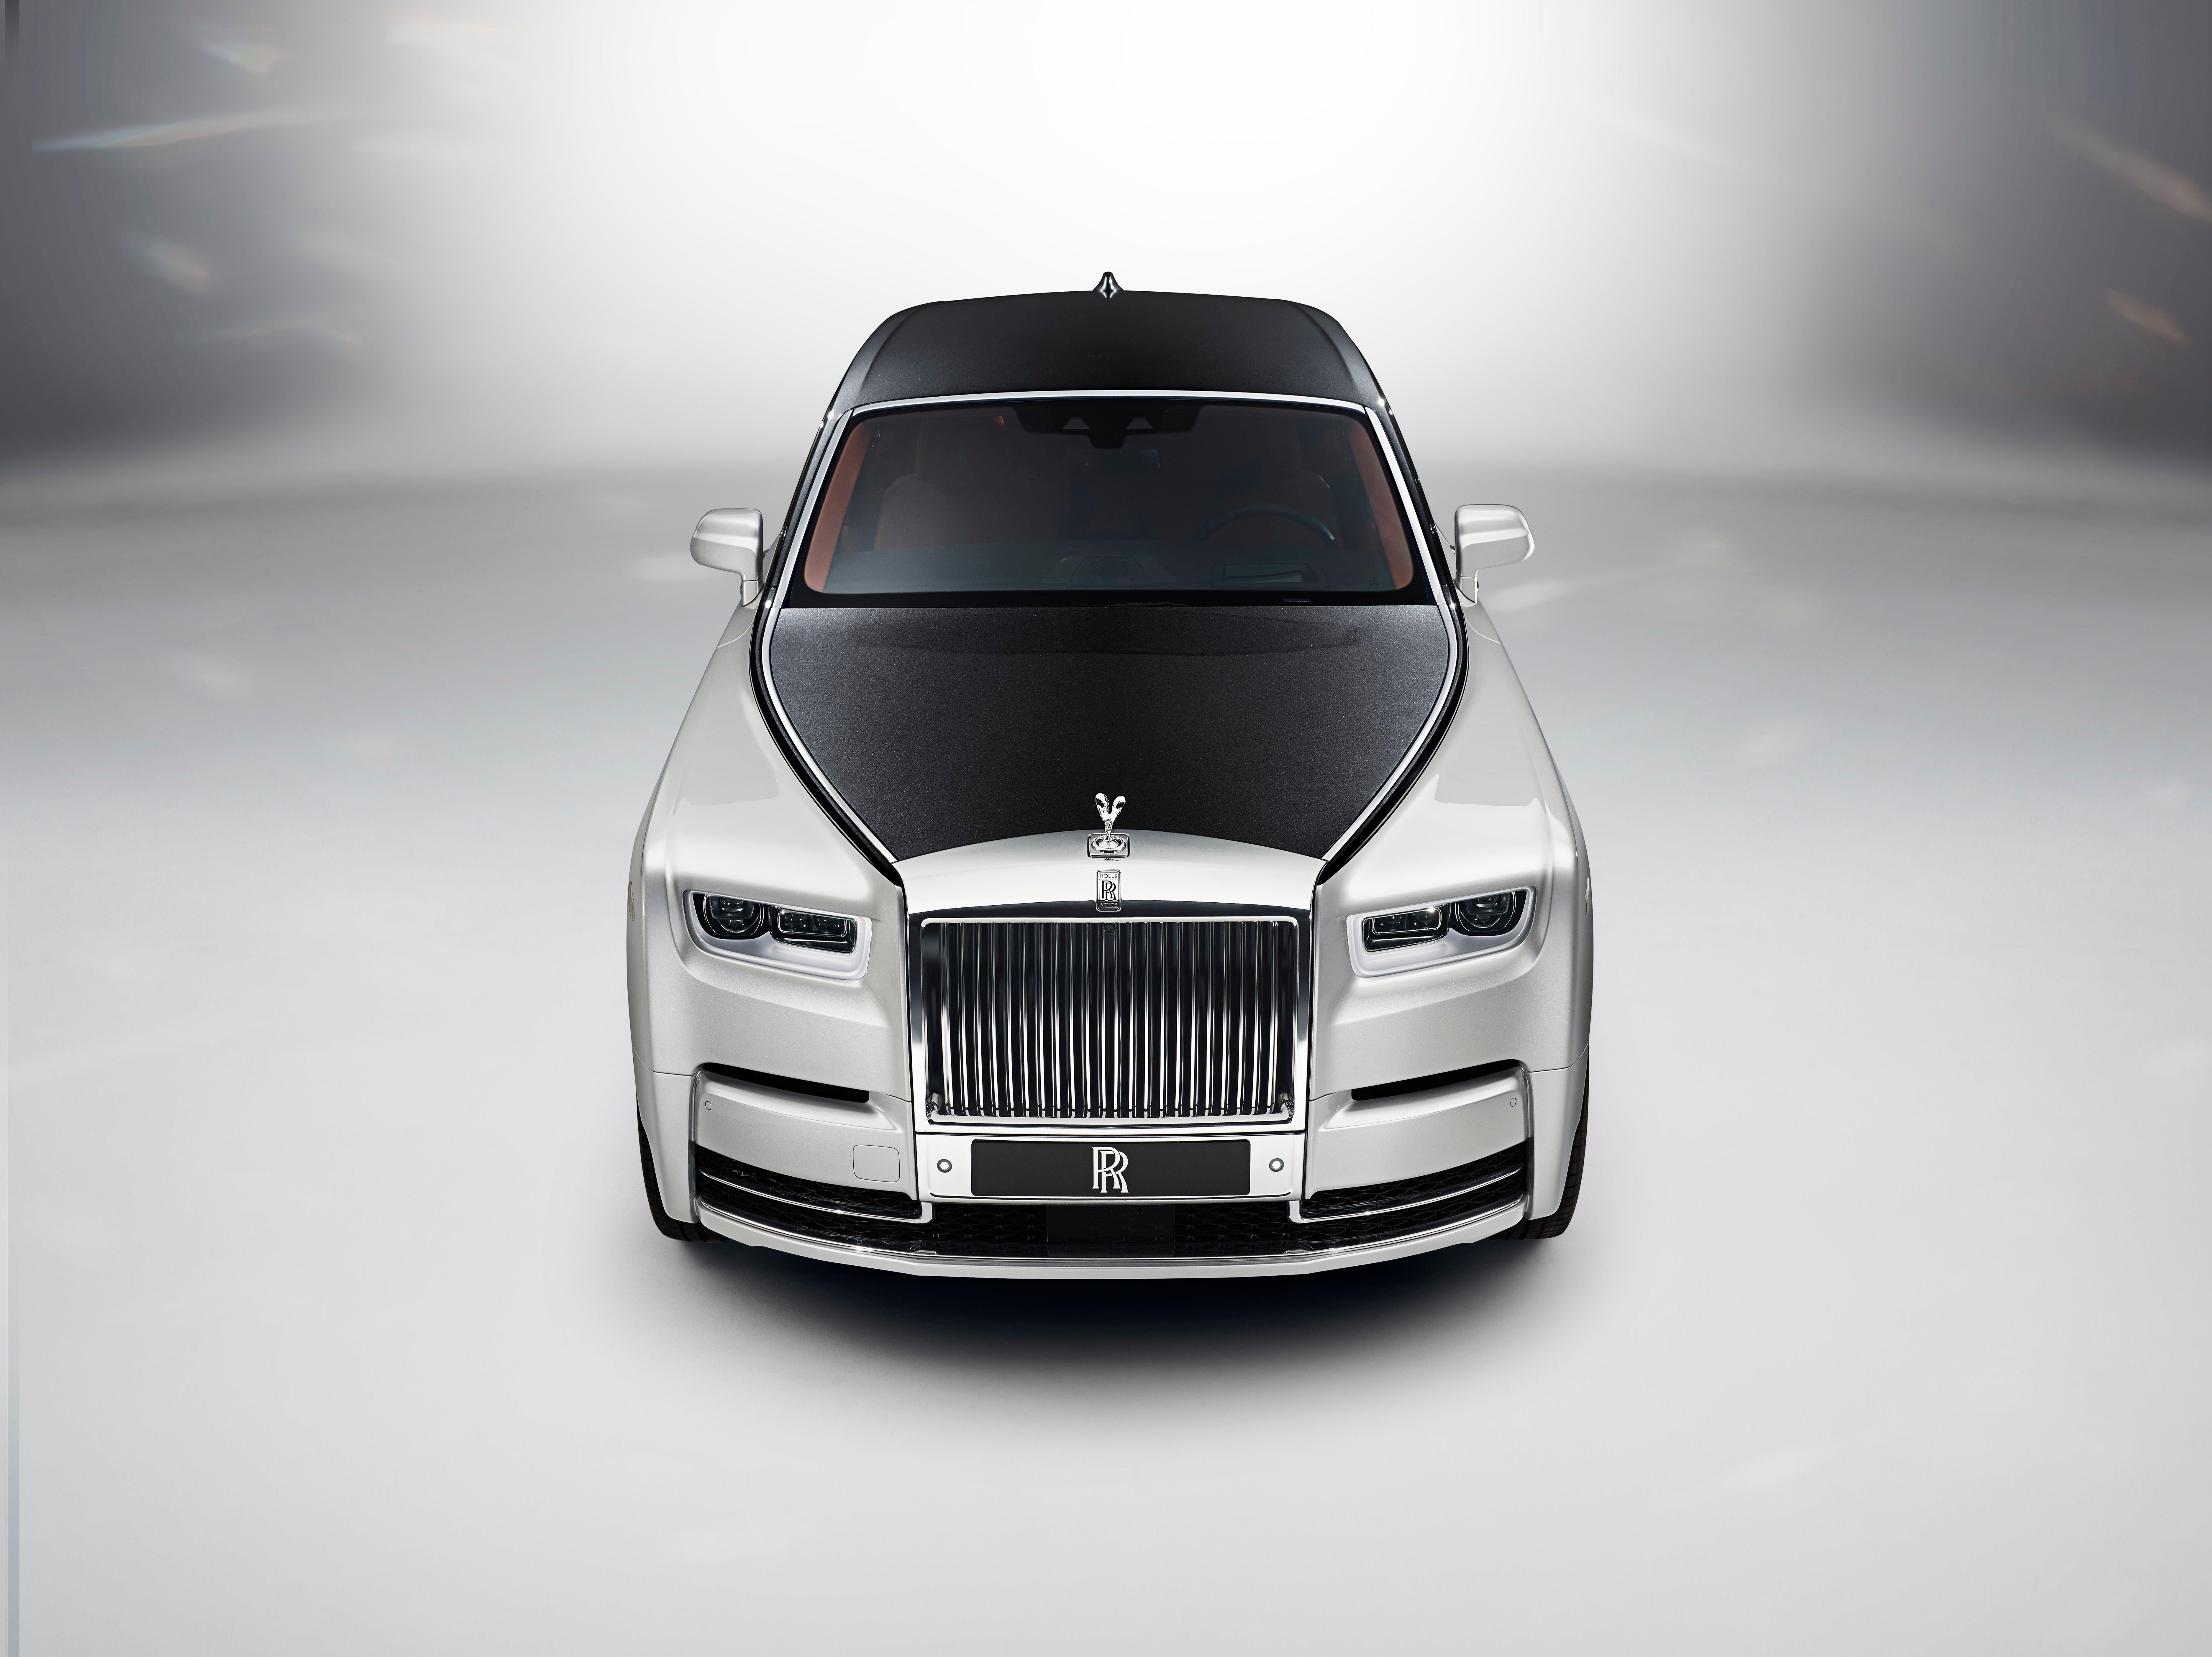 A Rolls-Royce Phantom.